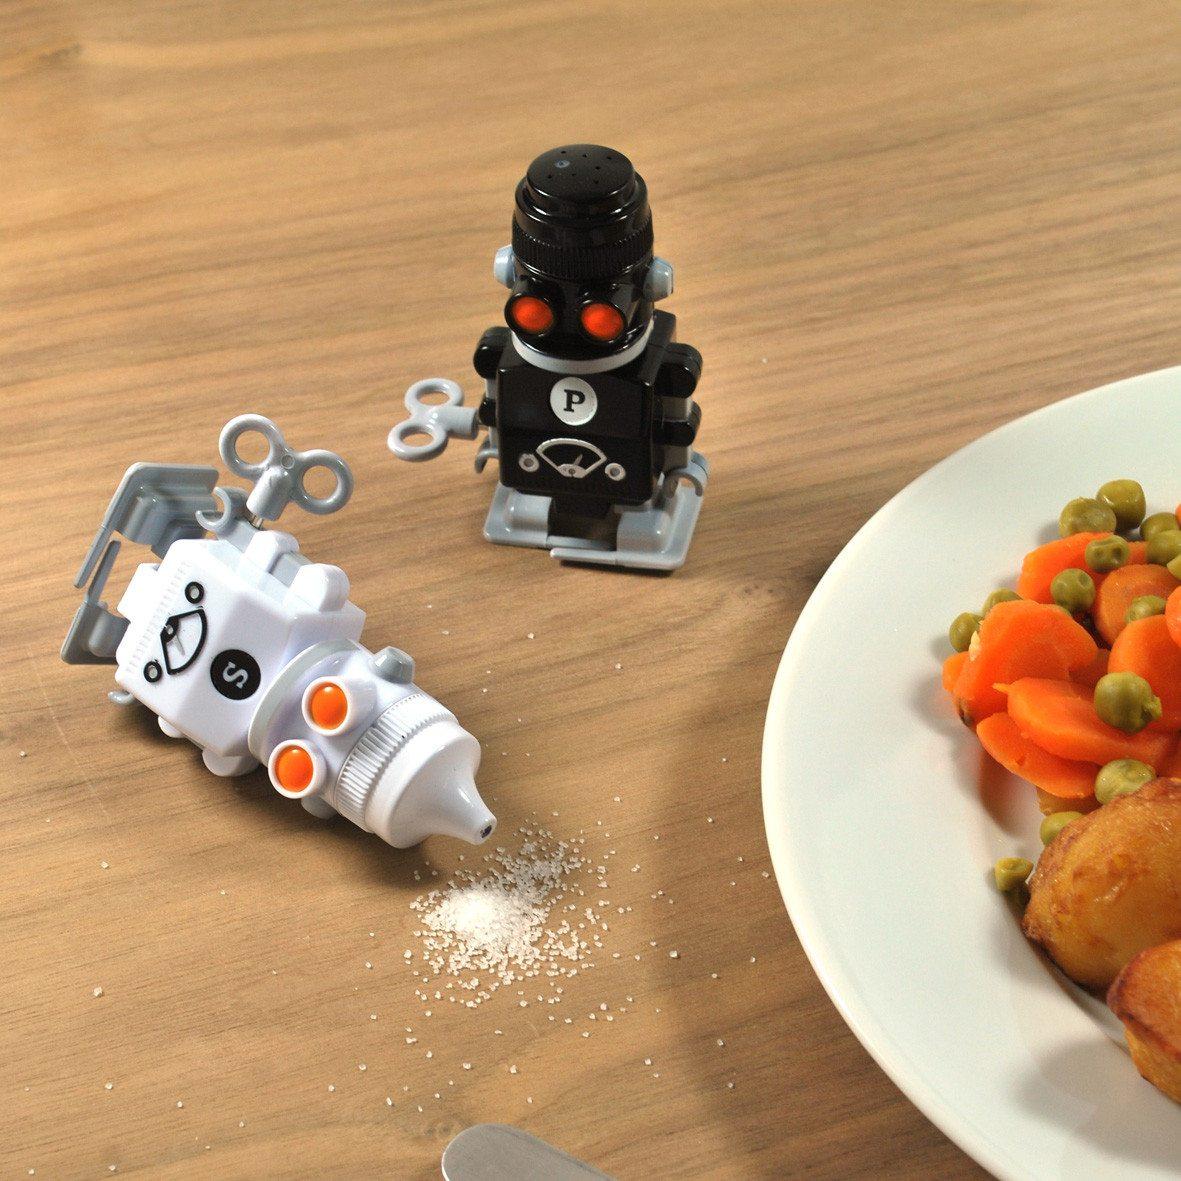 Peper- en zoutrobots